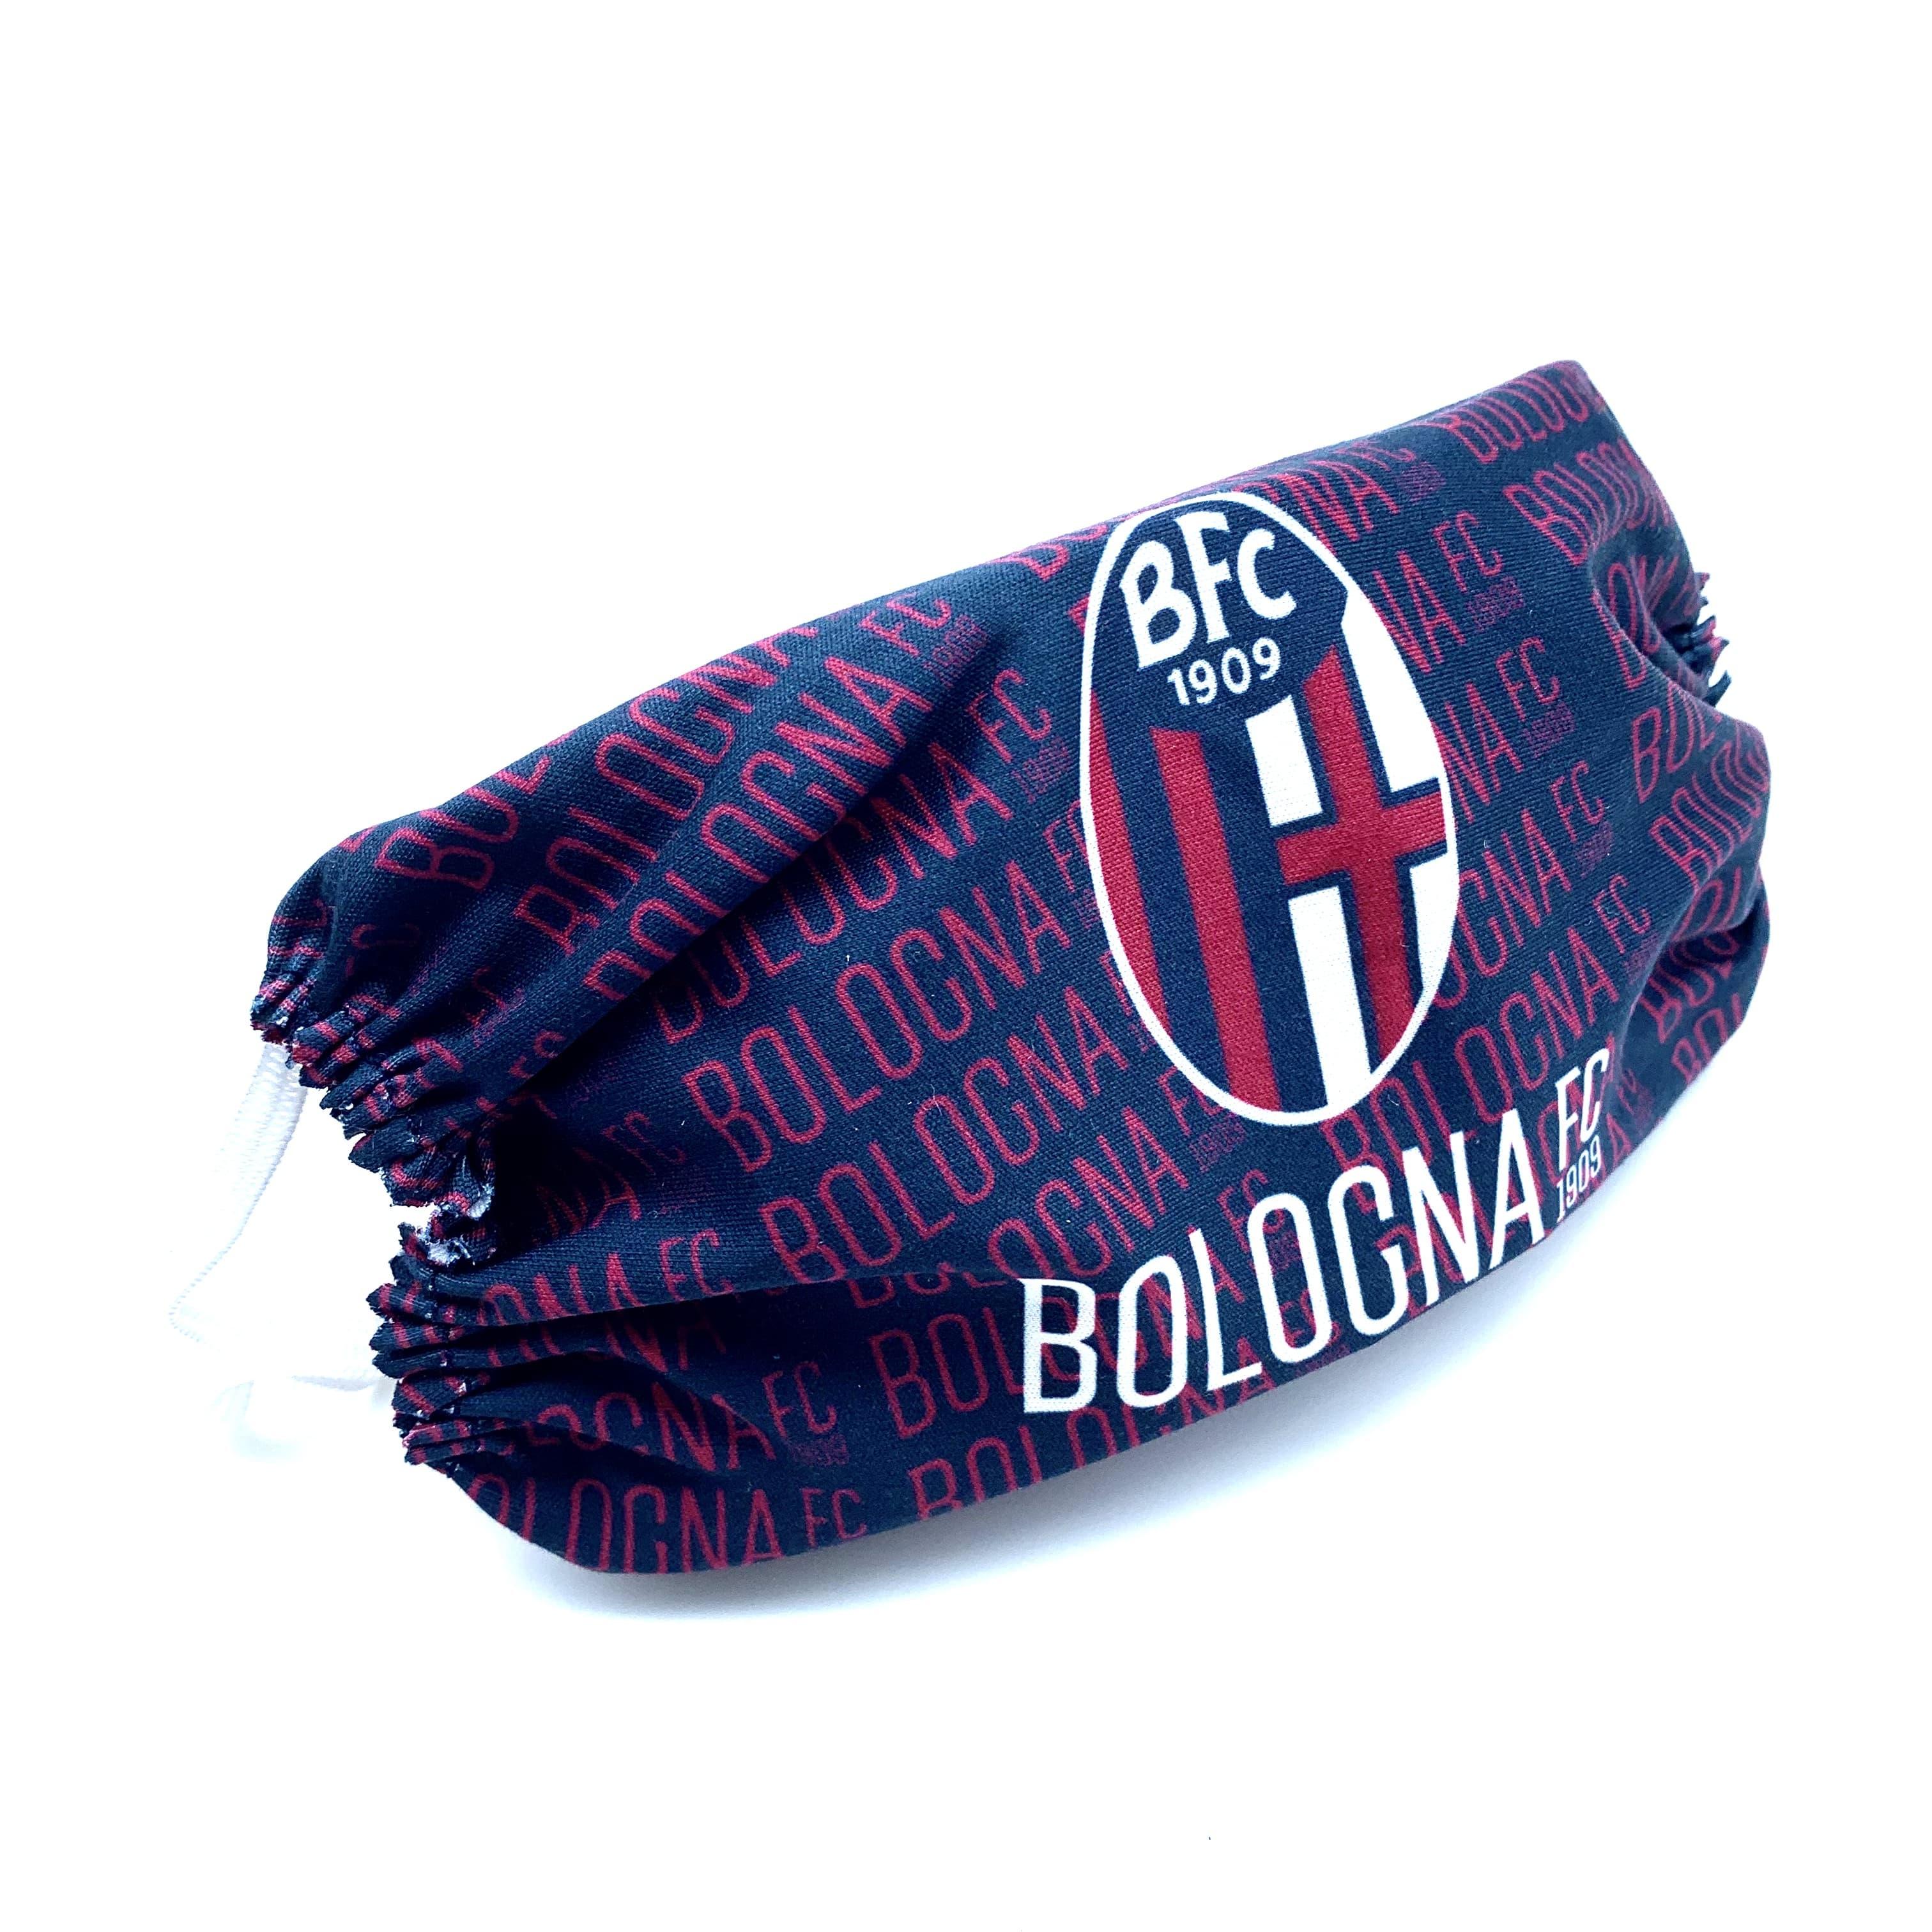 Bologna Fc COPRIMASCHERINA BOLOGNA ALLOVER